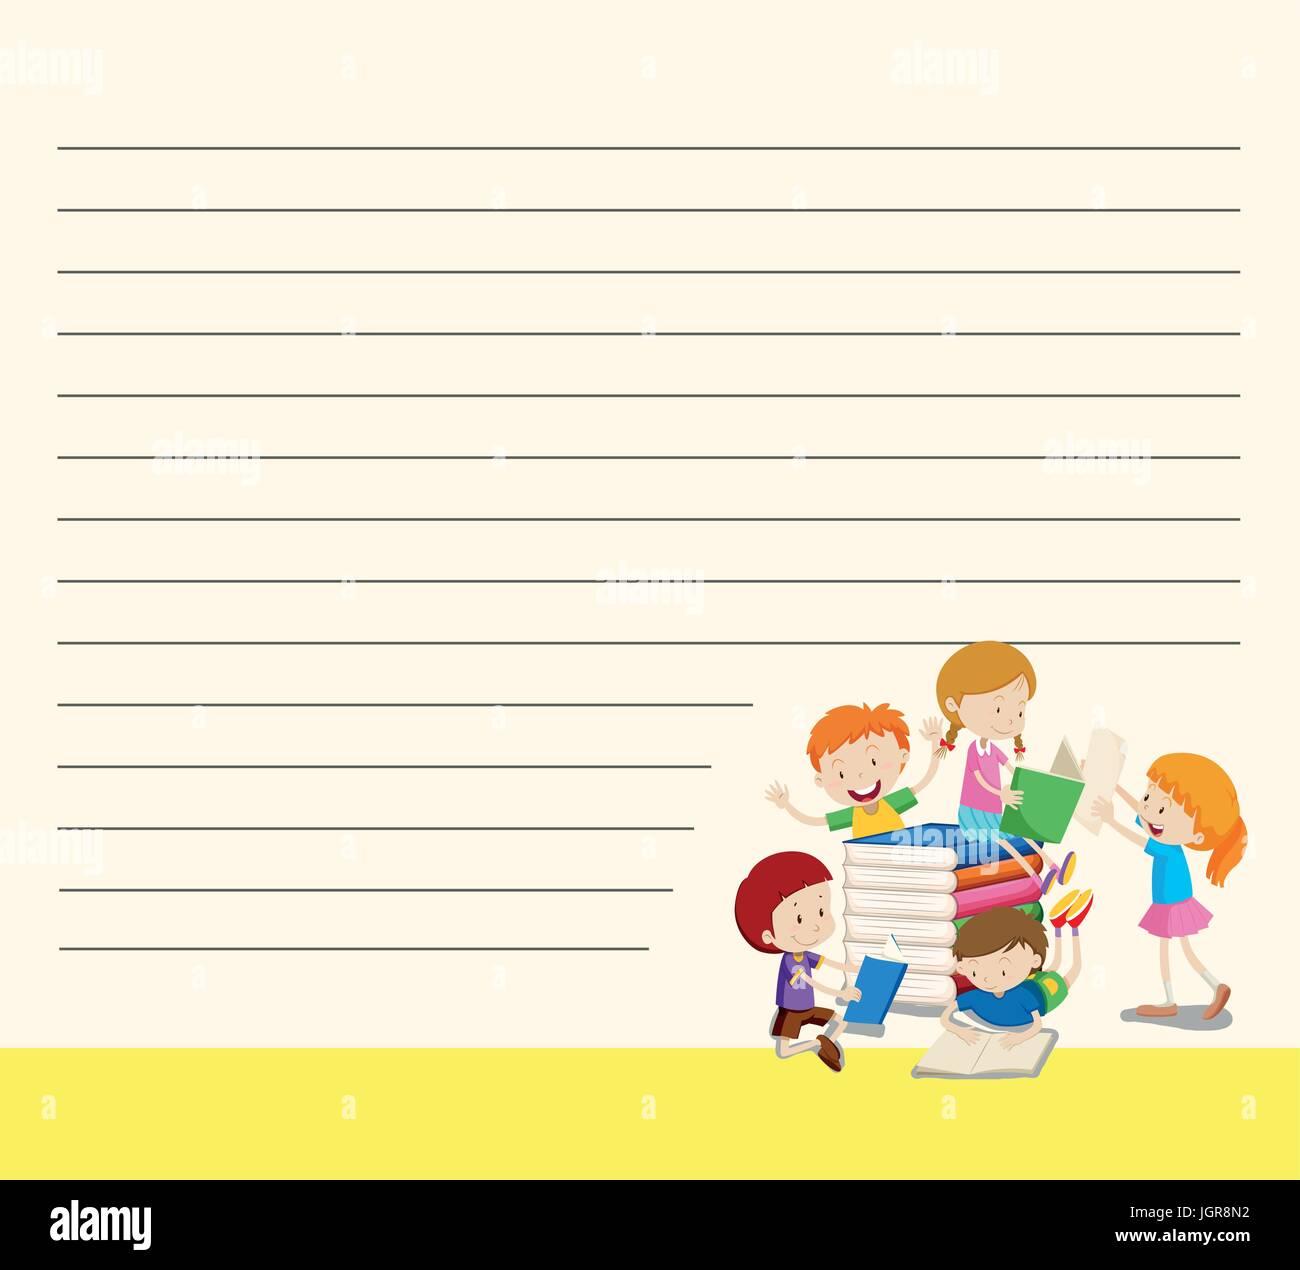 Illustration Line Drawing Reading Book Stockfotos & Illustration ...